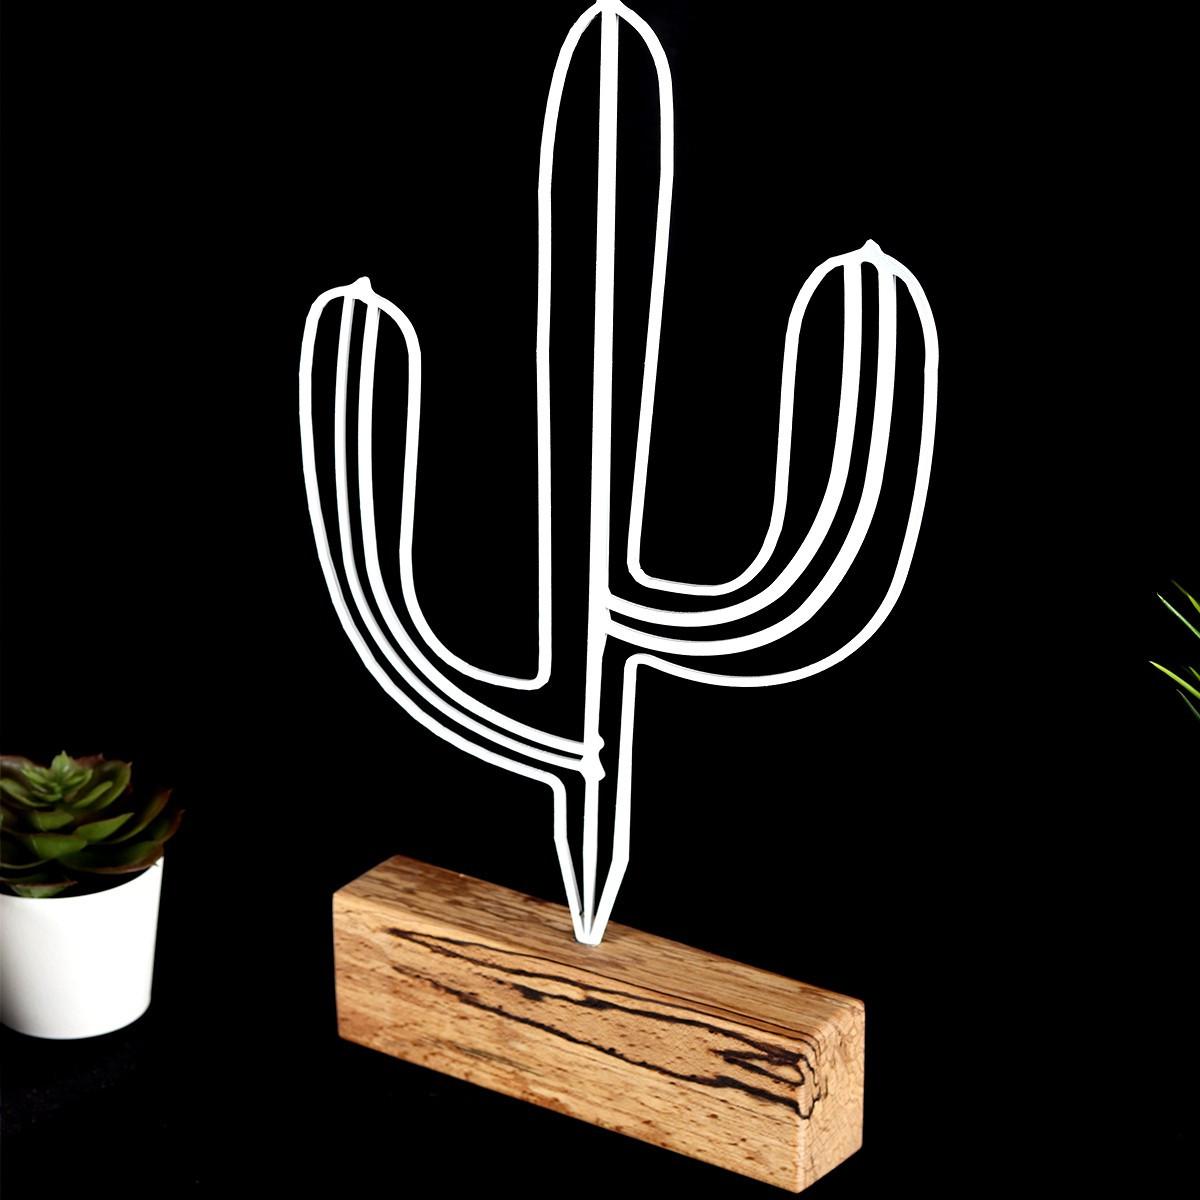 Decorative Object Cactus | White